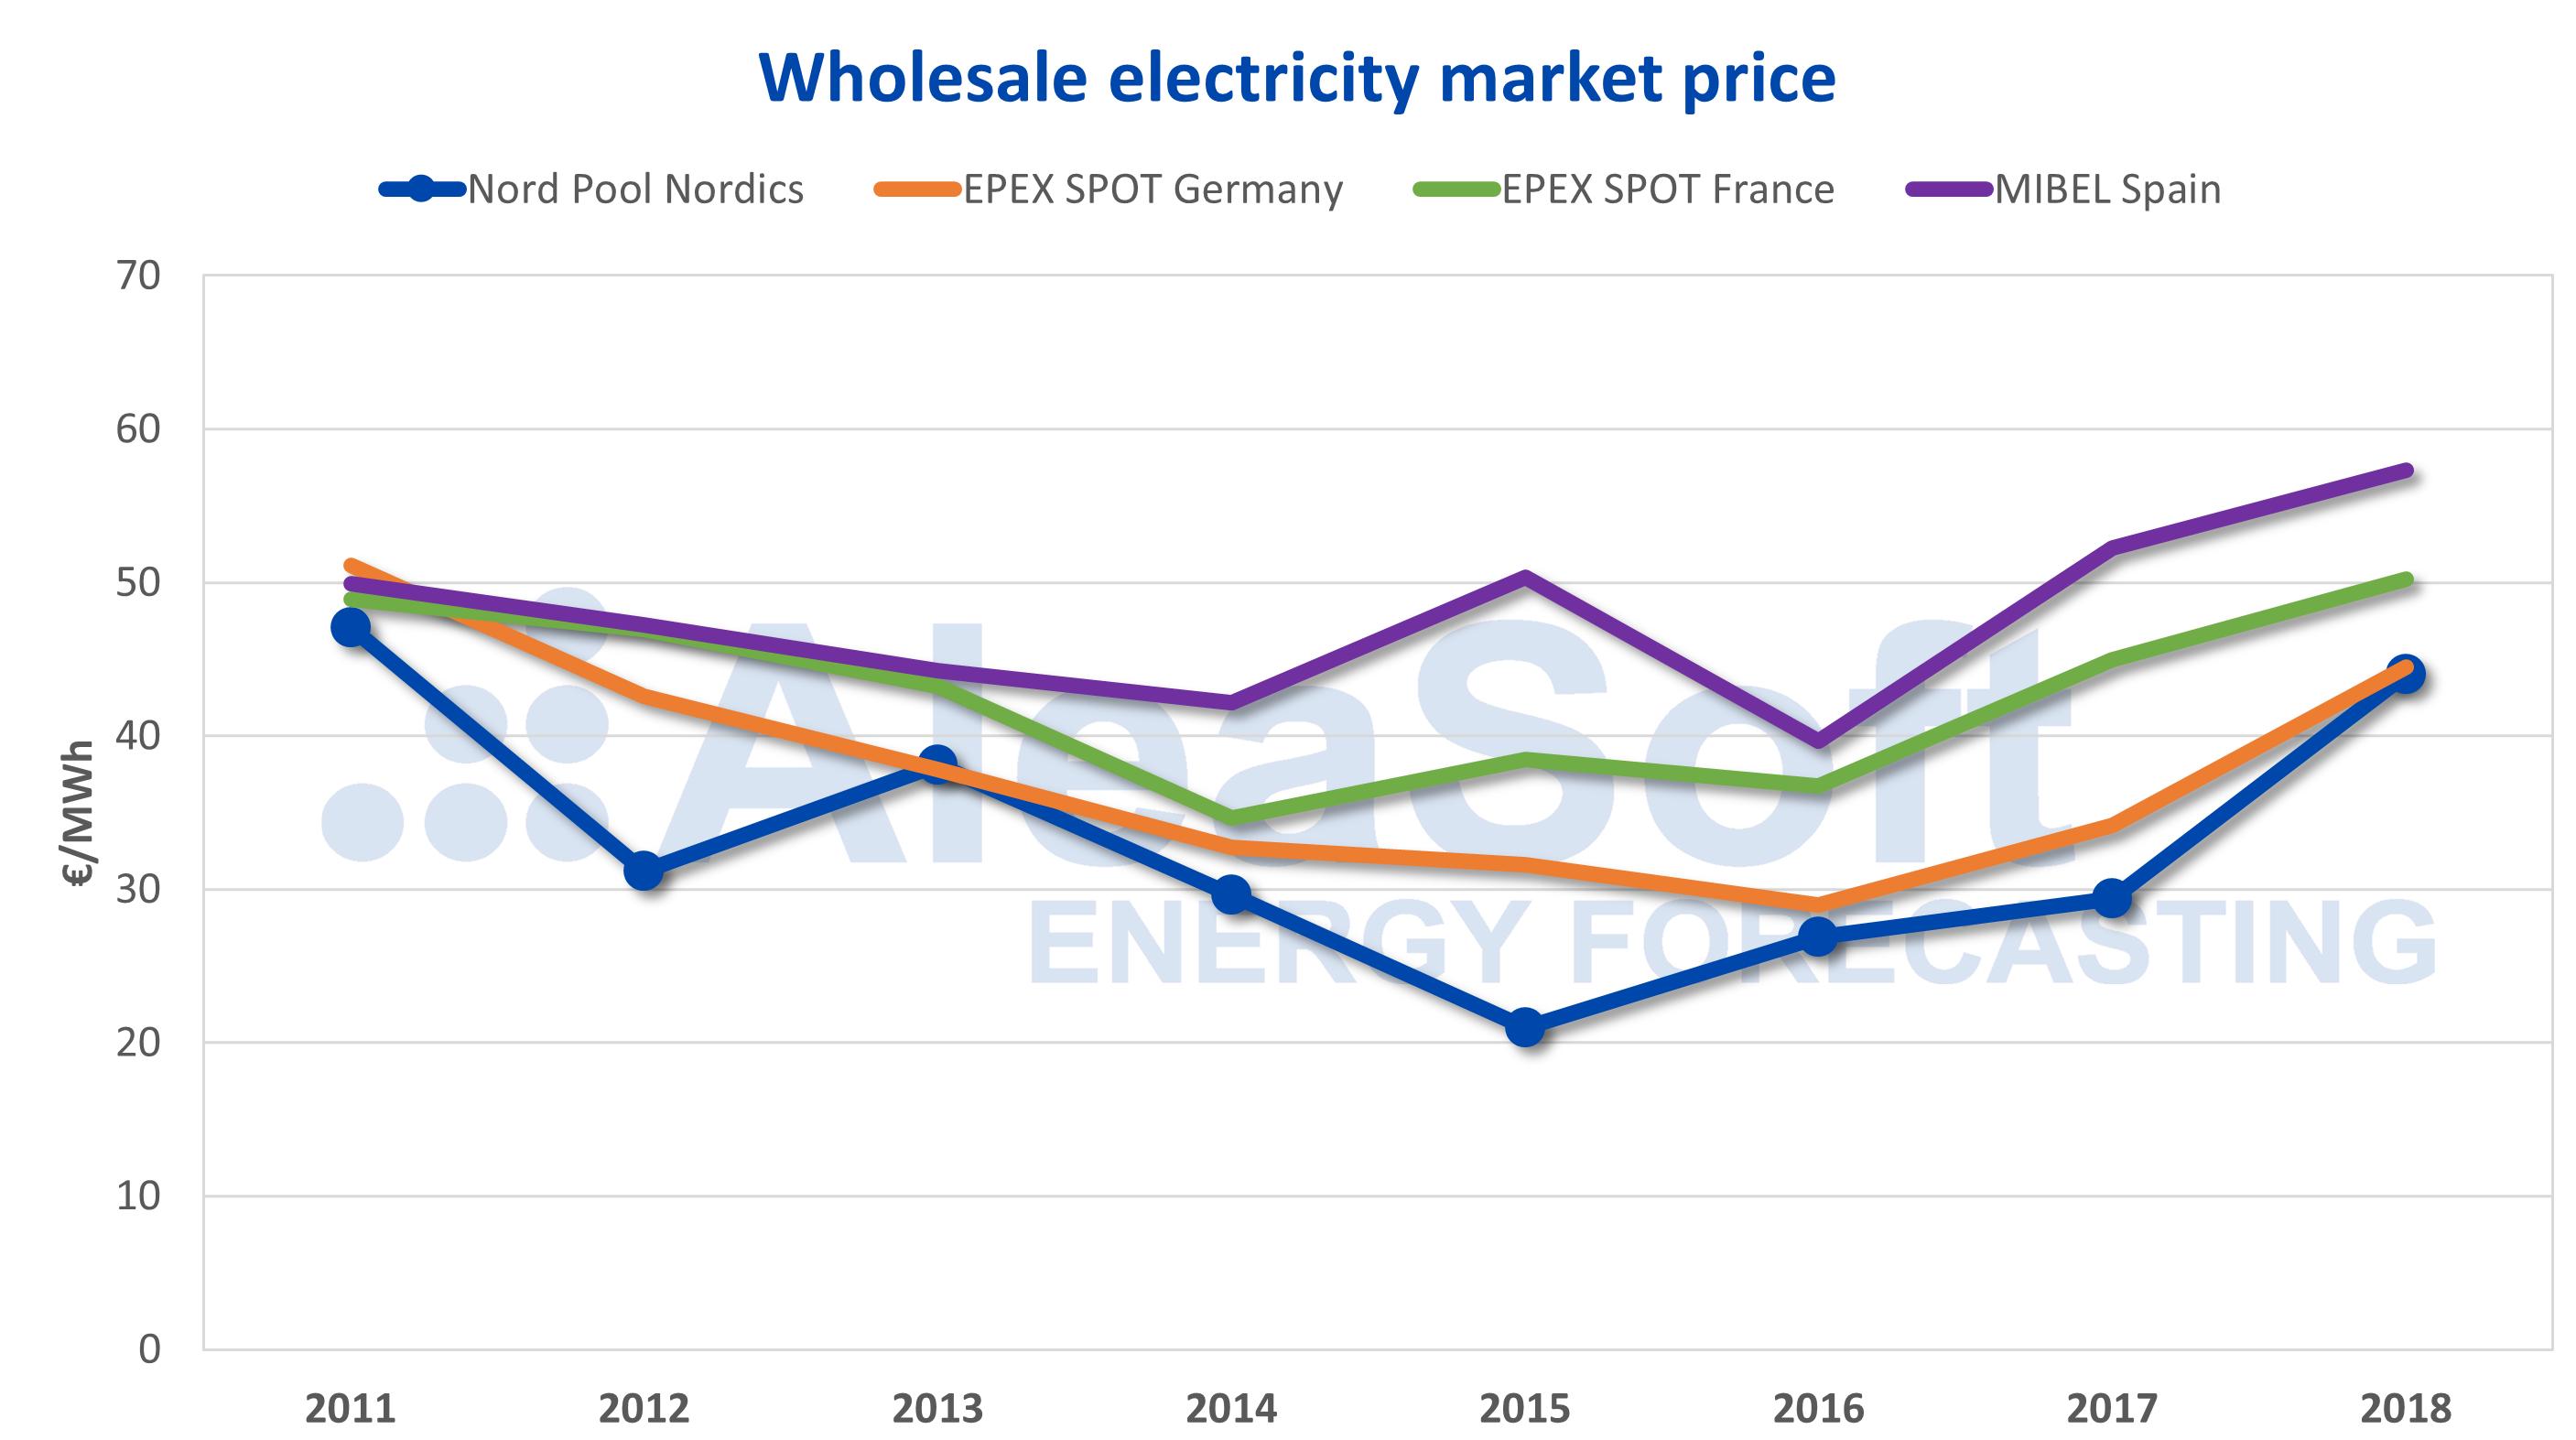 AleaSoft - Electricity market prices Europe